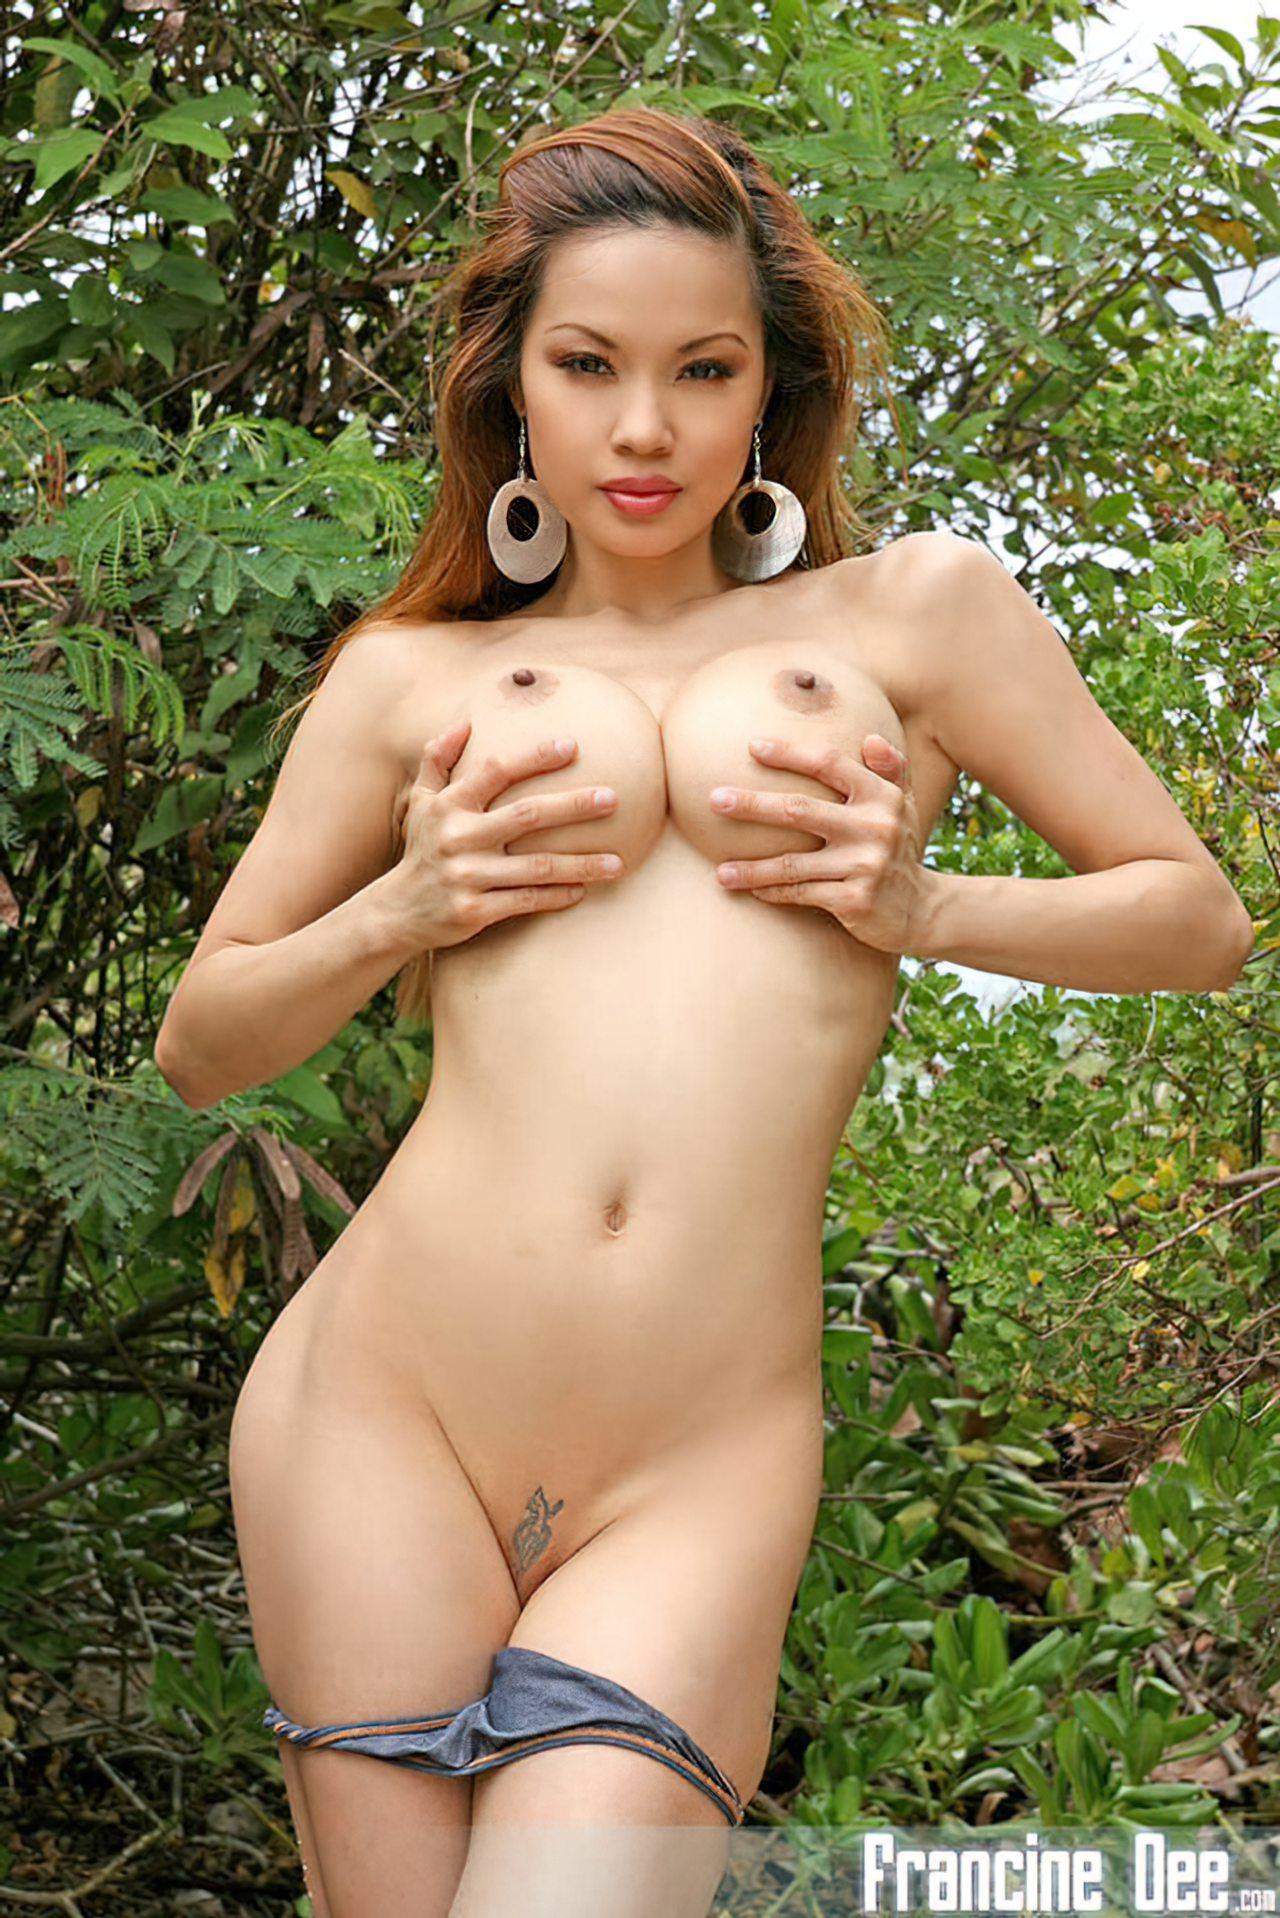 Francine Dee (7)